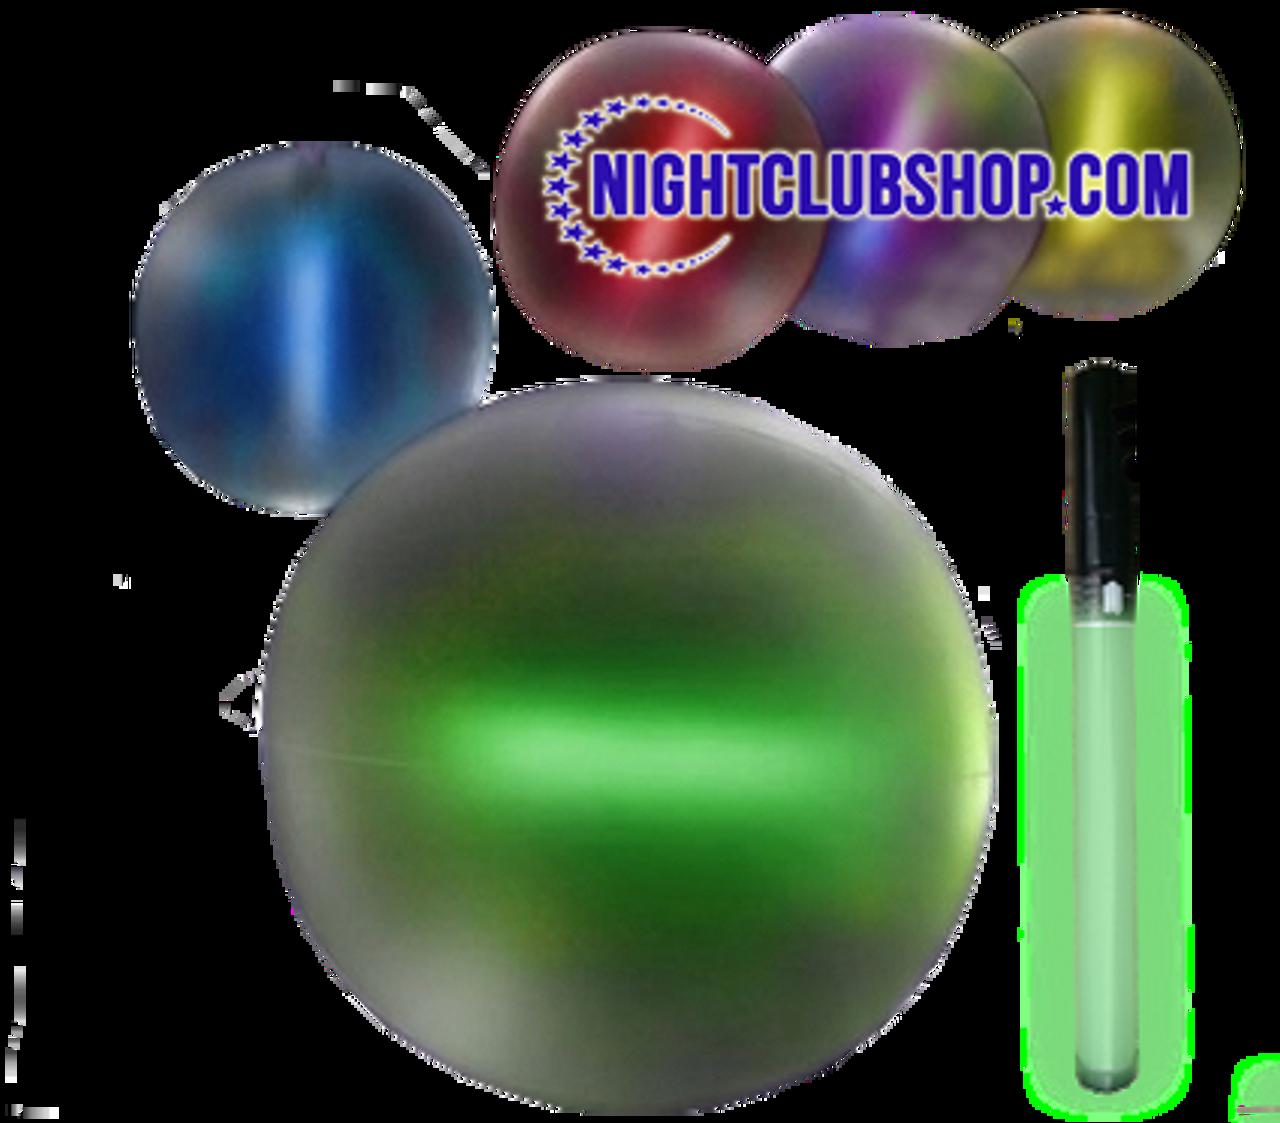 LED, Wand, Puck, Light, for beachball, LED Beach ball, LED Beachball, Light up, Beachball, Beach Ball, glow, illuminated